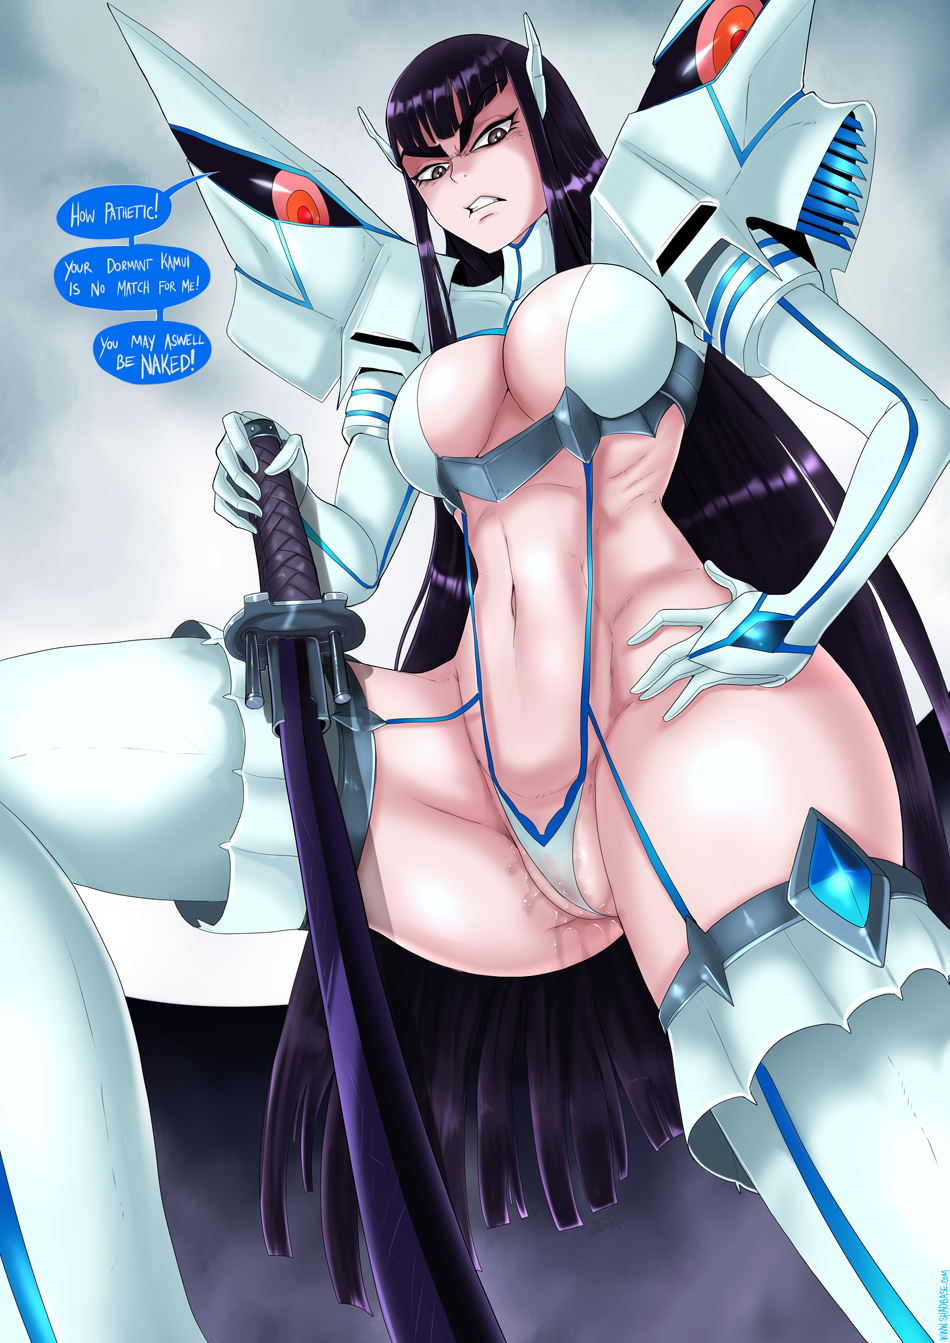 la junketsu kill ryuko kill Night shift nurses mana kazama